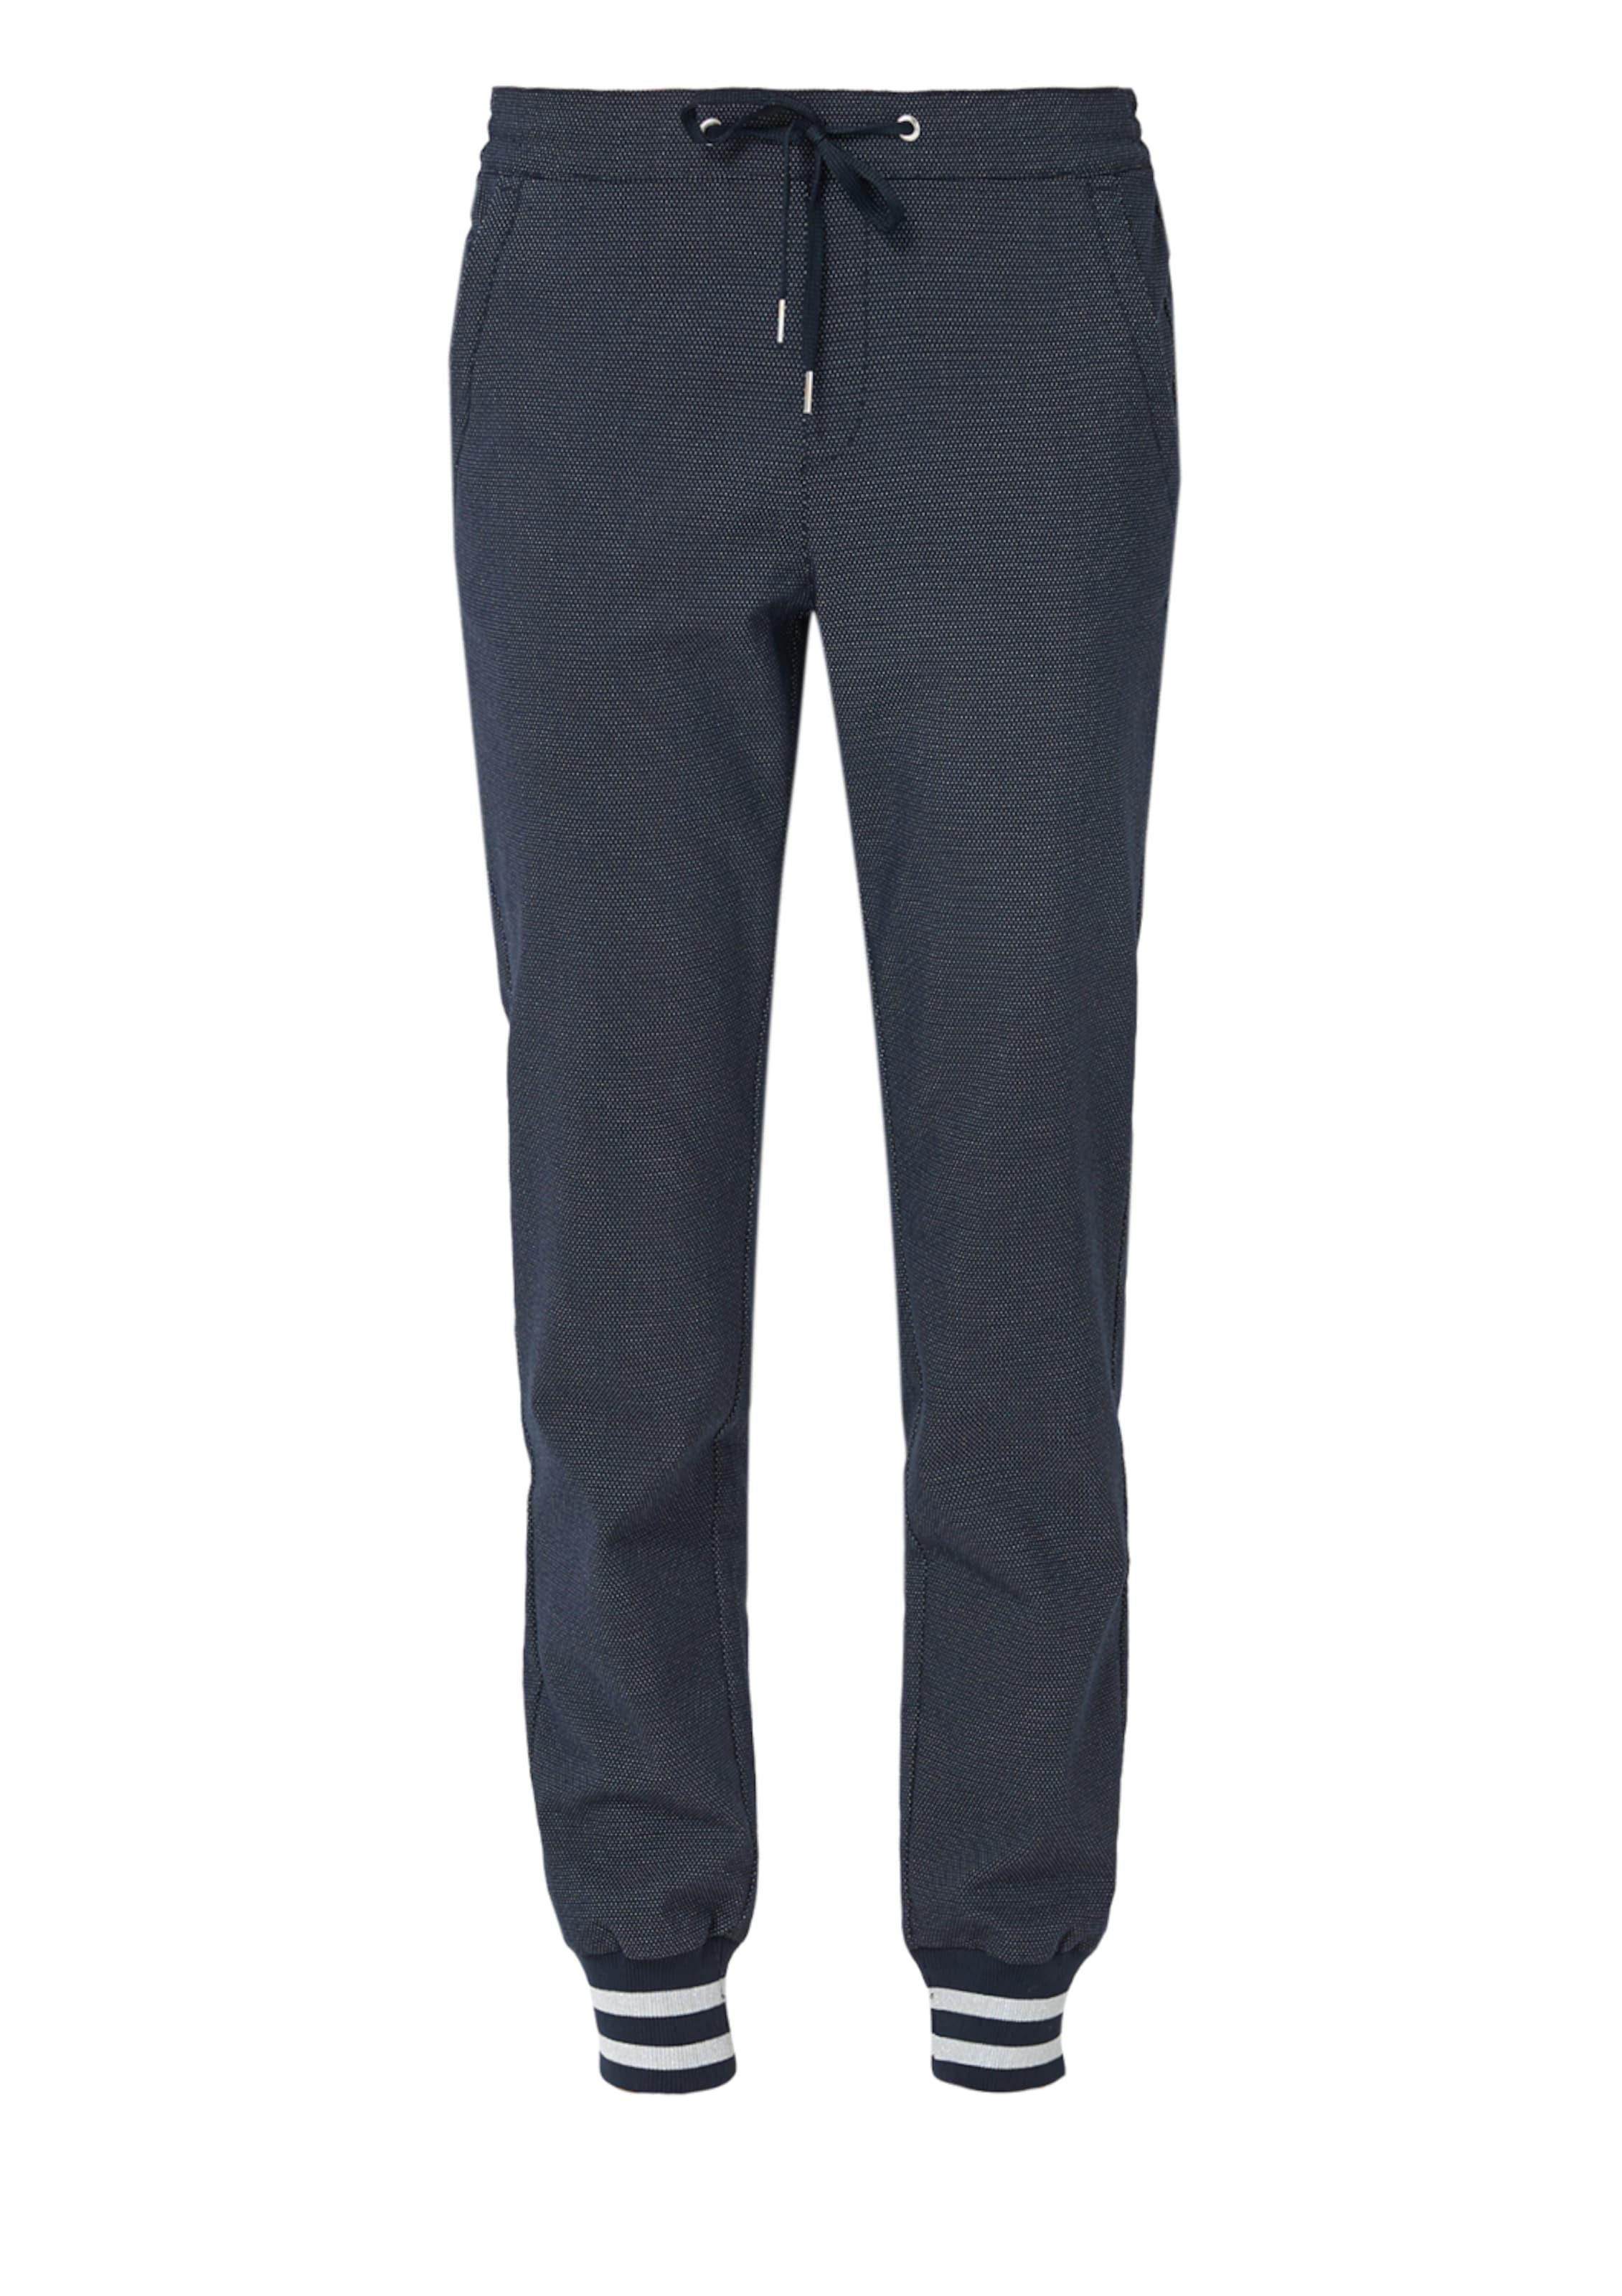 In S oliver Label NachtblauWeiß Red Pants jR354AL